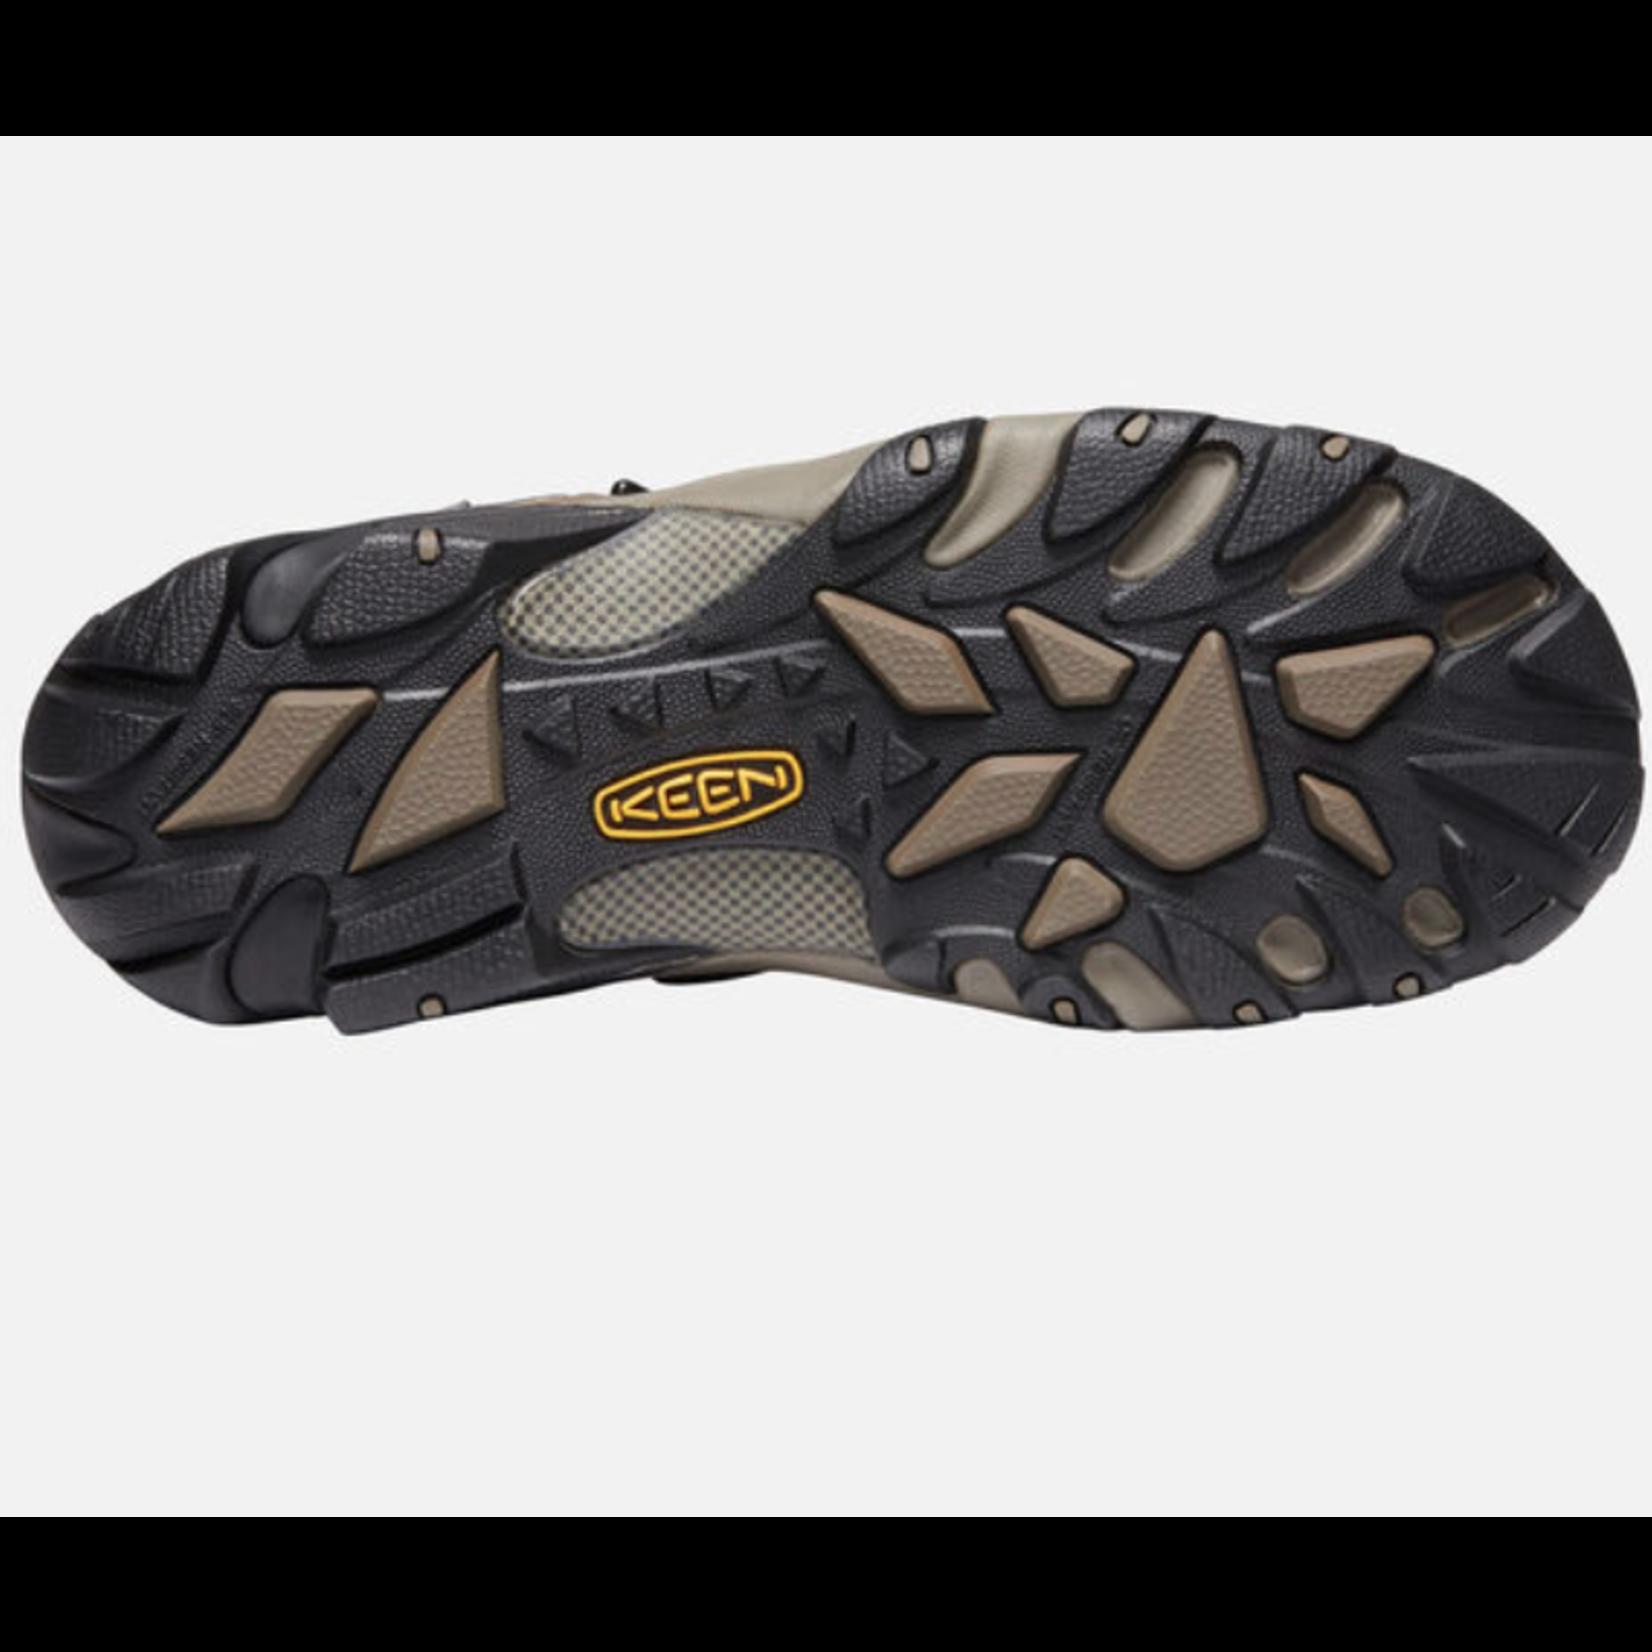 Keen Keen Men's CSA Lansing Mid WP (Steel Toe) - 1021332